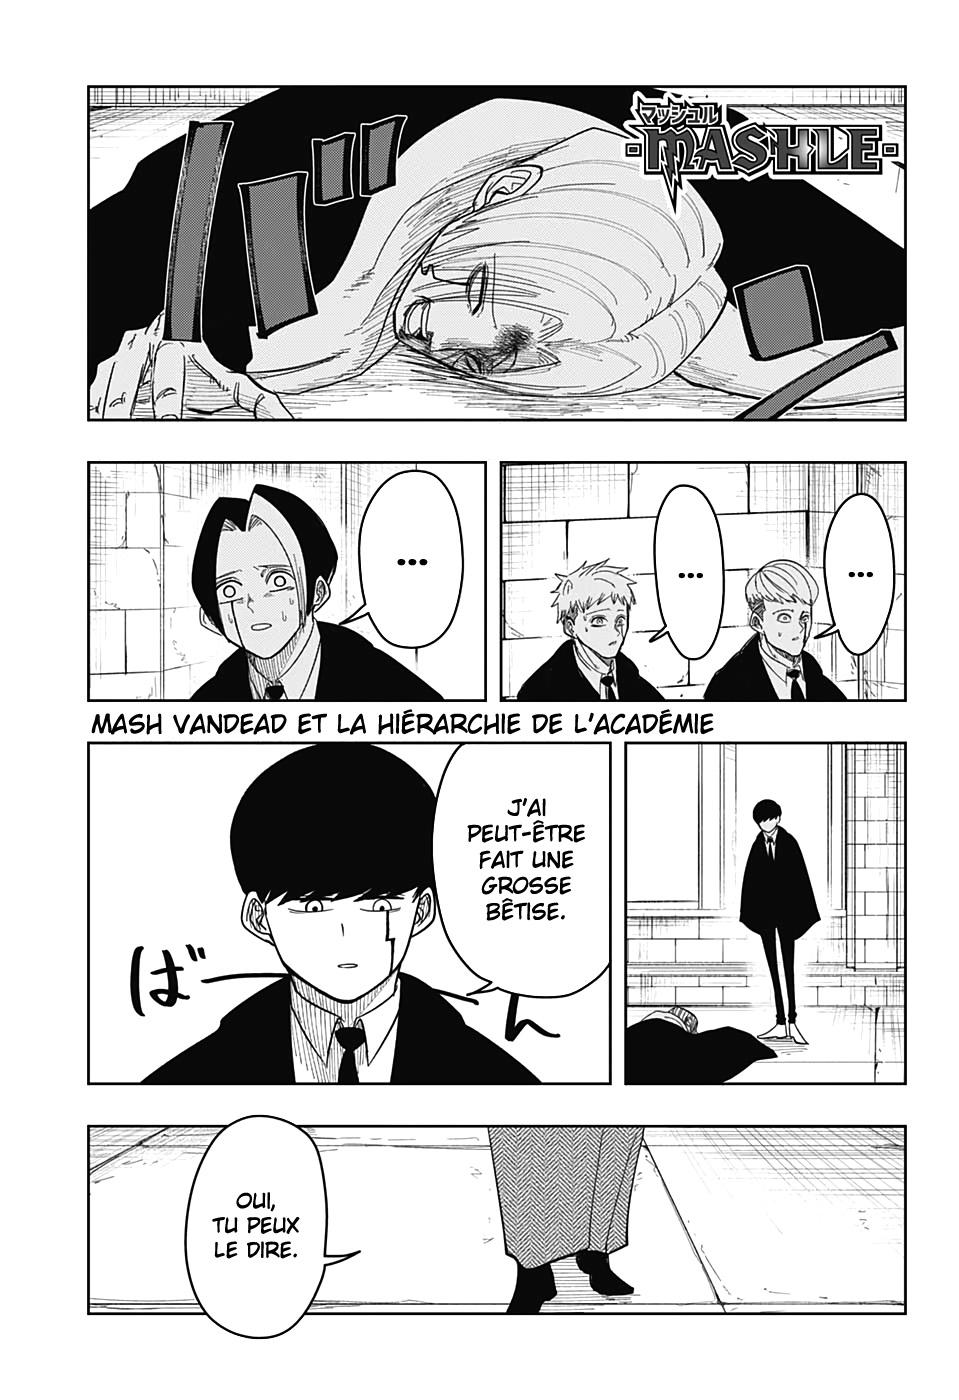 https://nine.mangadogs.com/fr_manga/pic2/22/12502/562515/b827397ab57ed9b668621922d637b1d5.jpg Page 1